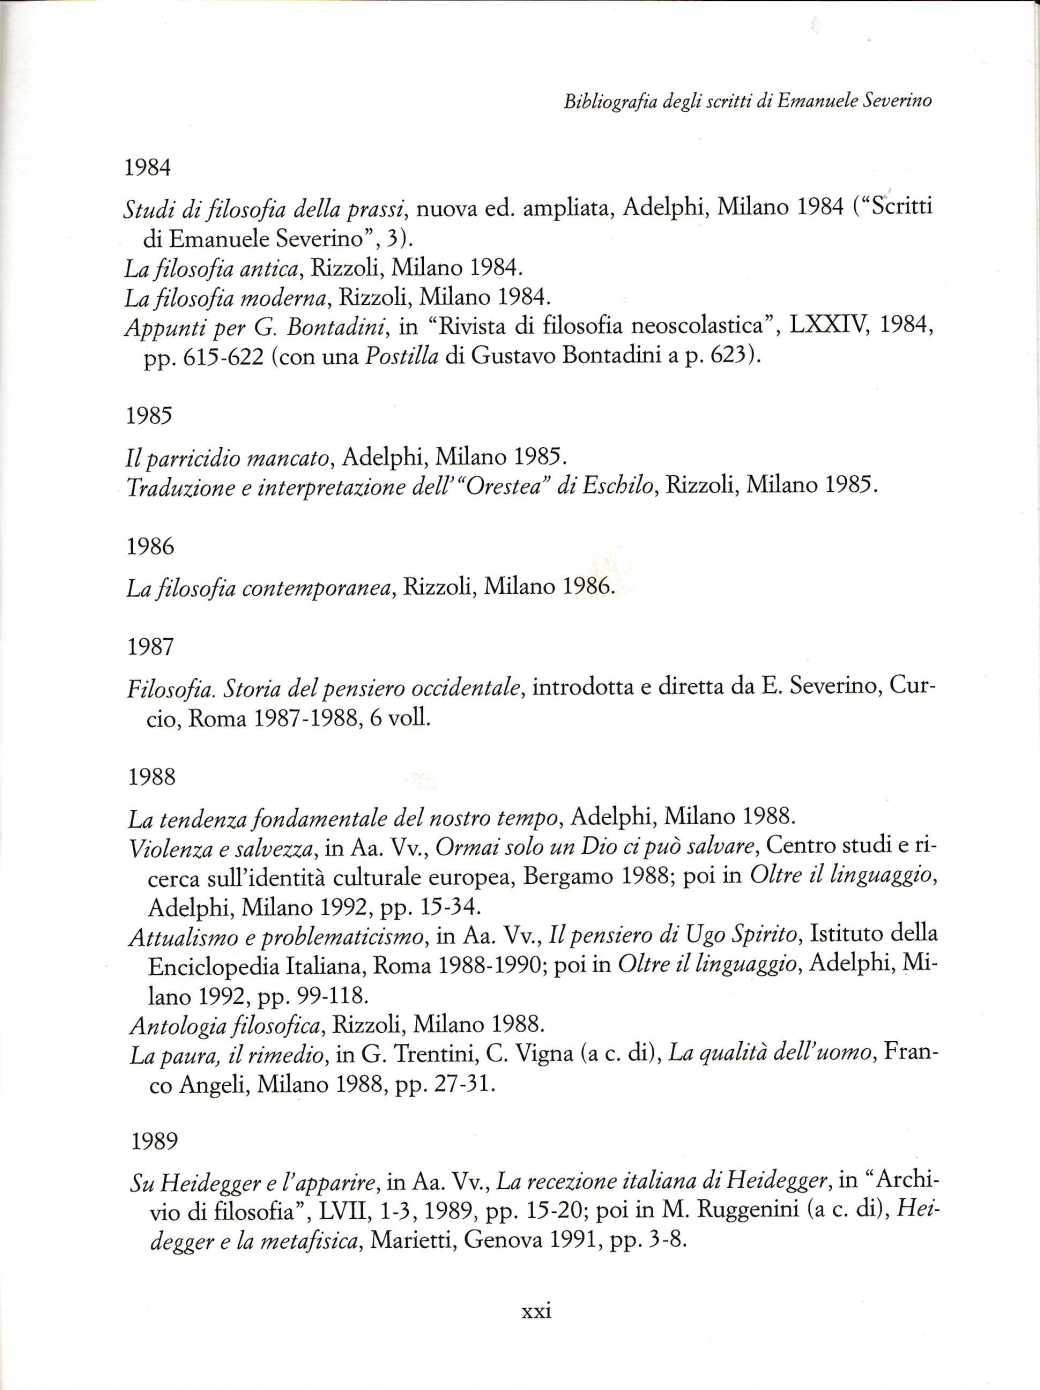 biblio brianese 1948-20051959